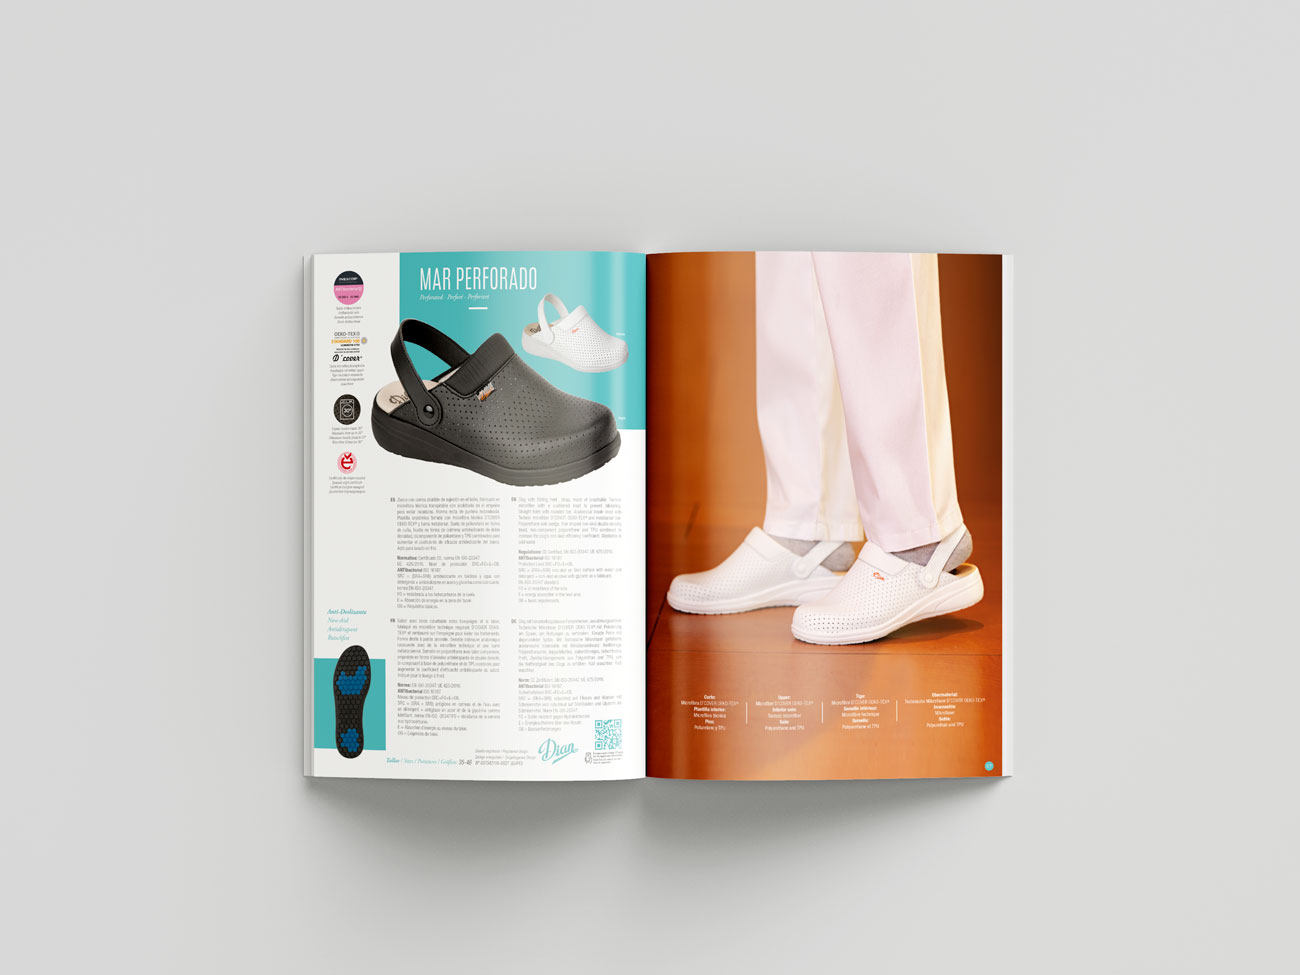 DIAN catalogo interior4b